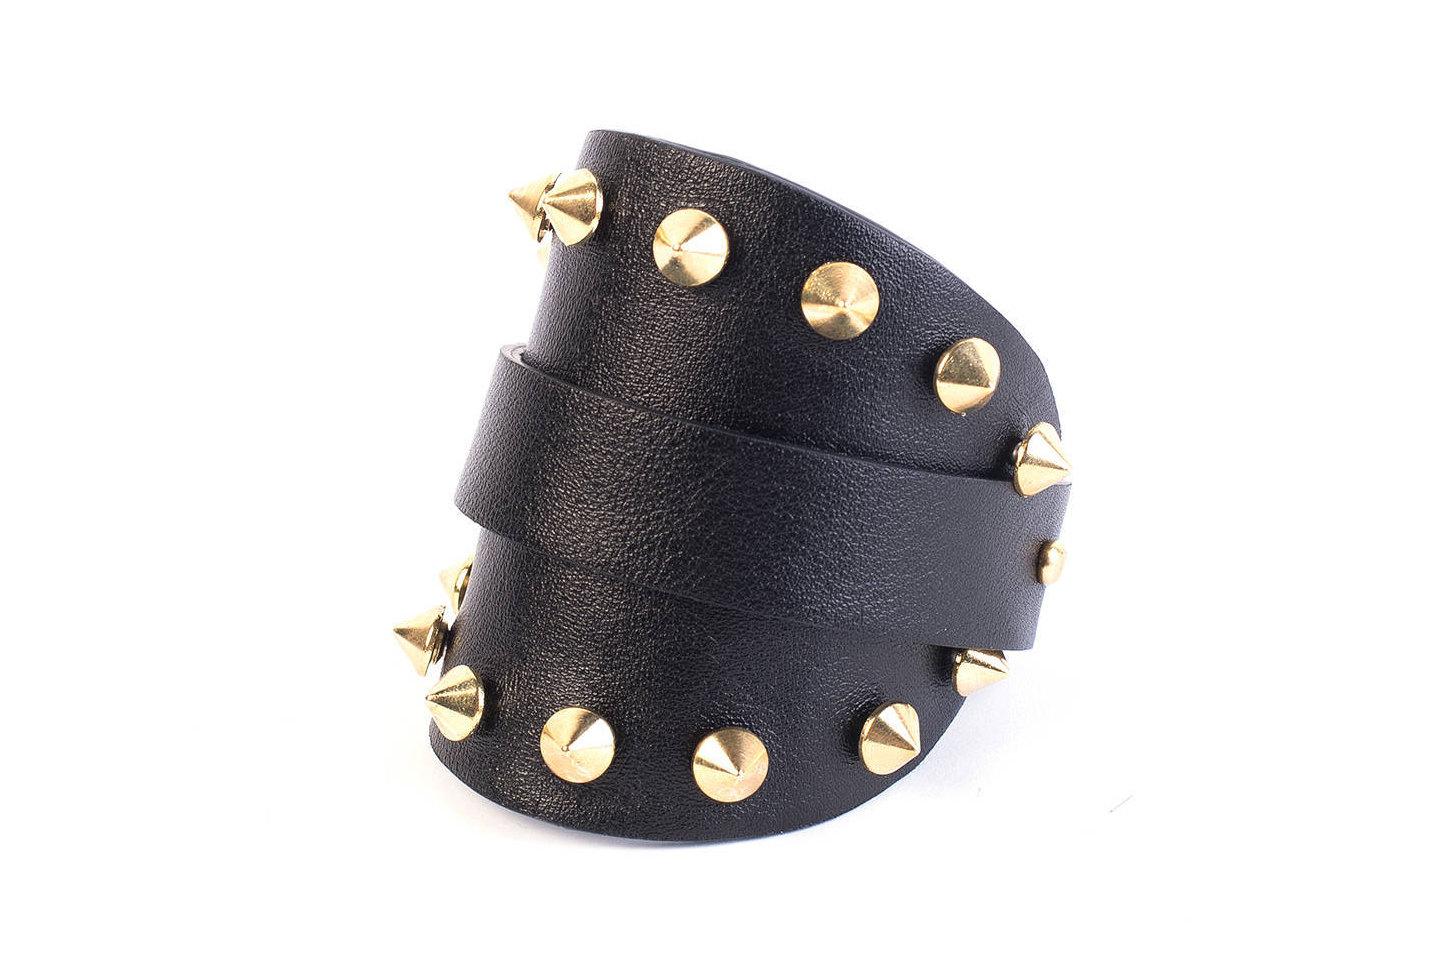 2e257e80a Rustic cuff bracelet, Studded bracelet, Black leather cuff bracelet ...